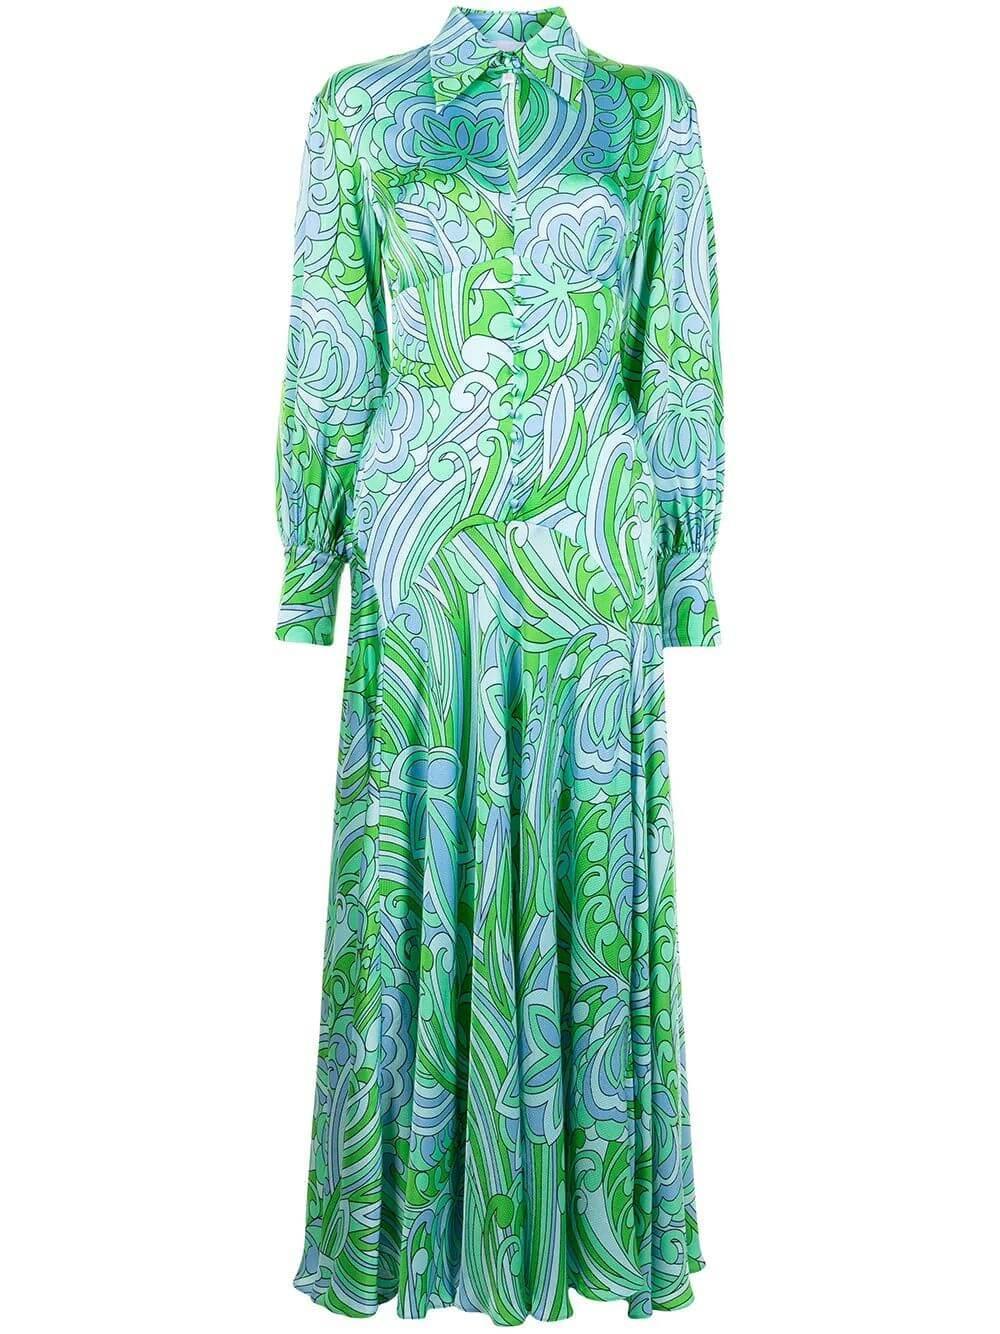 Mexicola Midi Dress